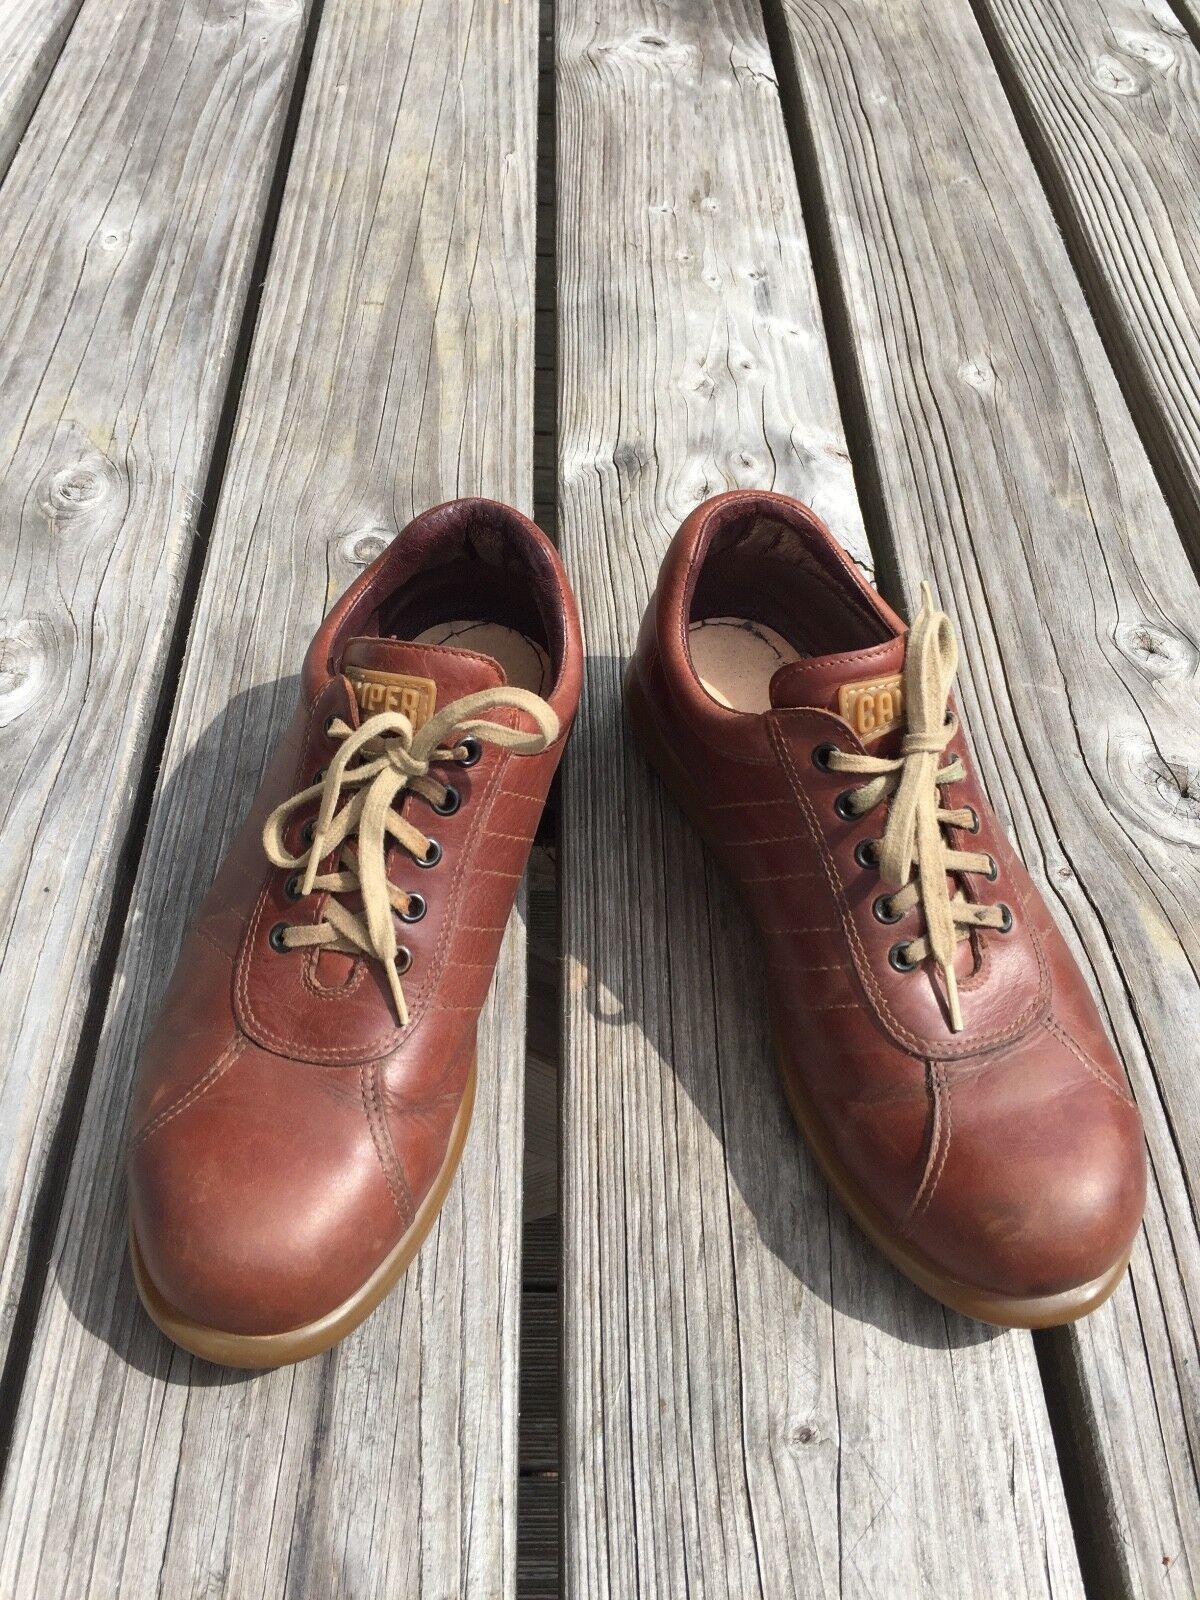 Camper Pelotas Braun Gr. 42 gebraucht Sneaker Halbschuh Leder